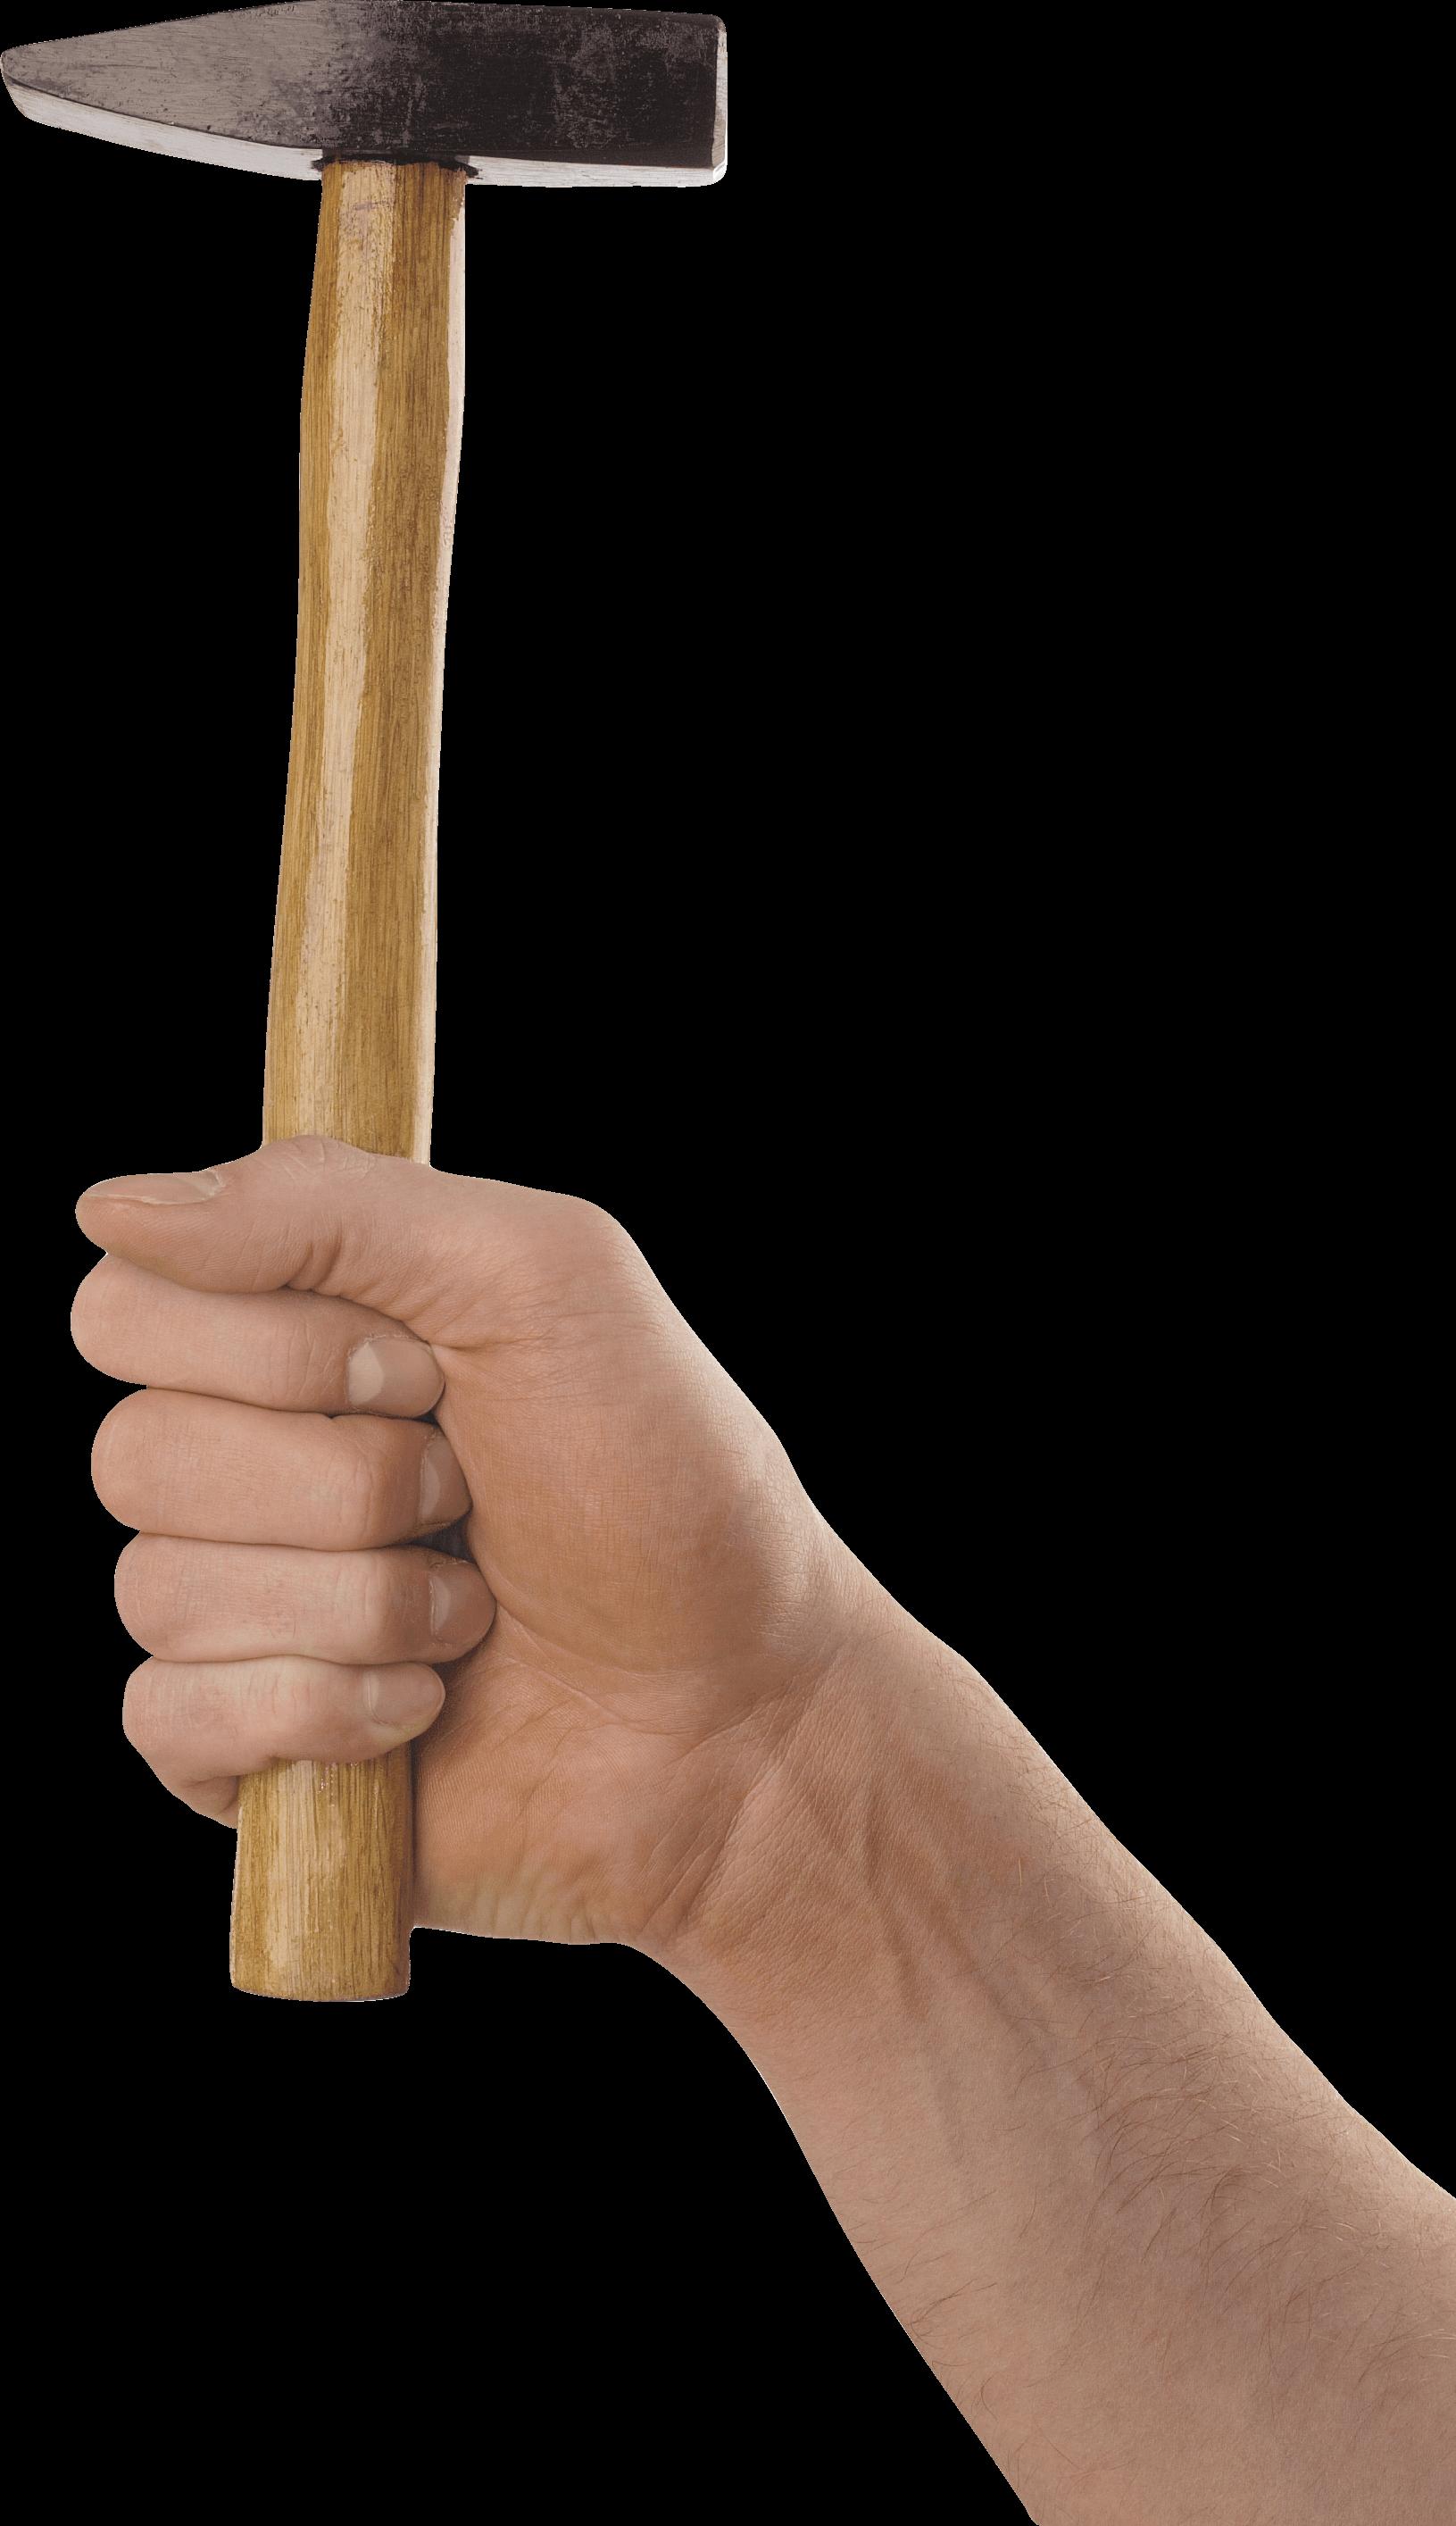 Arm holding hammer clipart banner transparent library Hand Holding Long Hammer transparent PNG - StickPNG banner transparent library